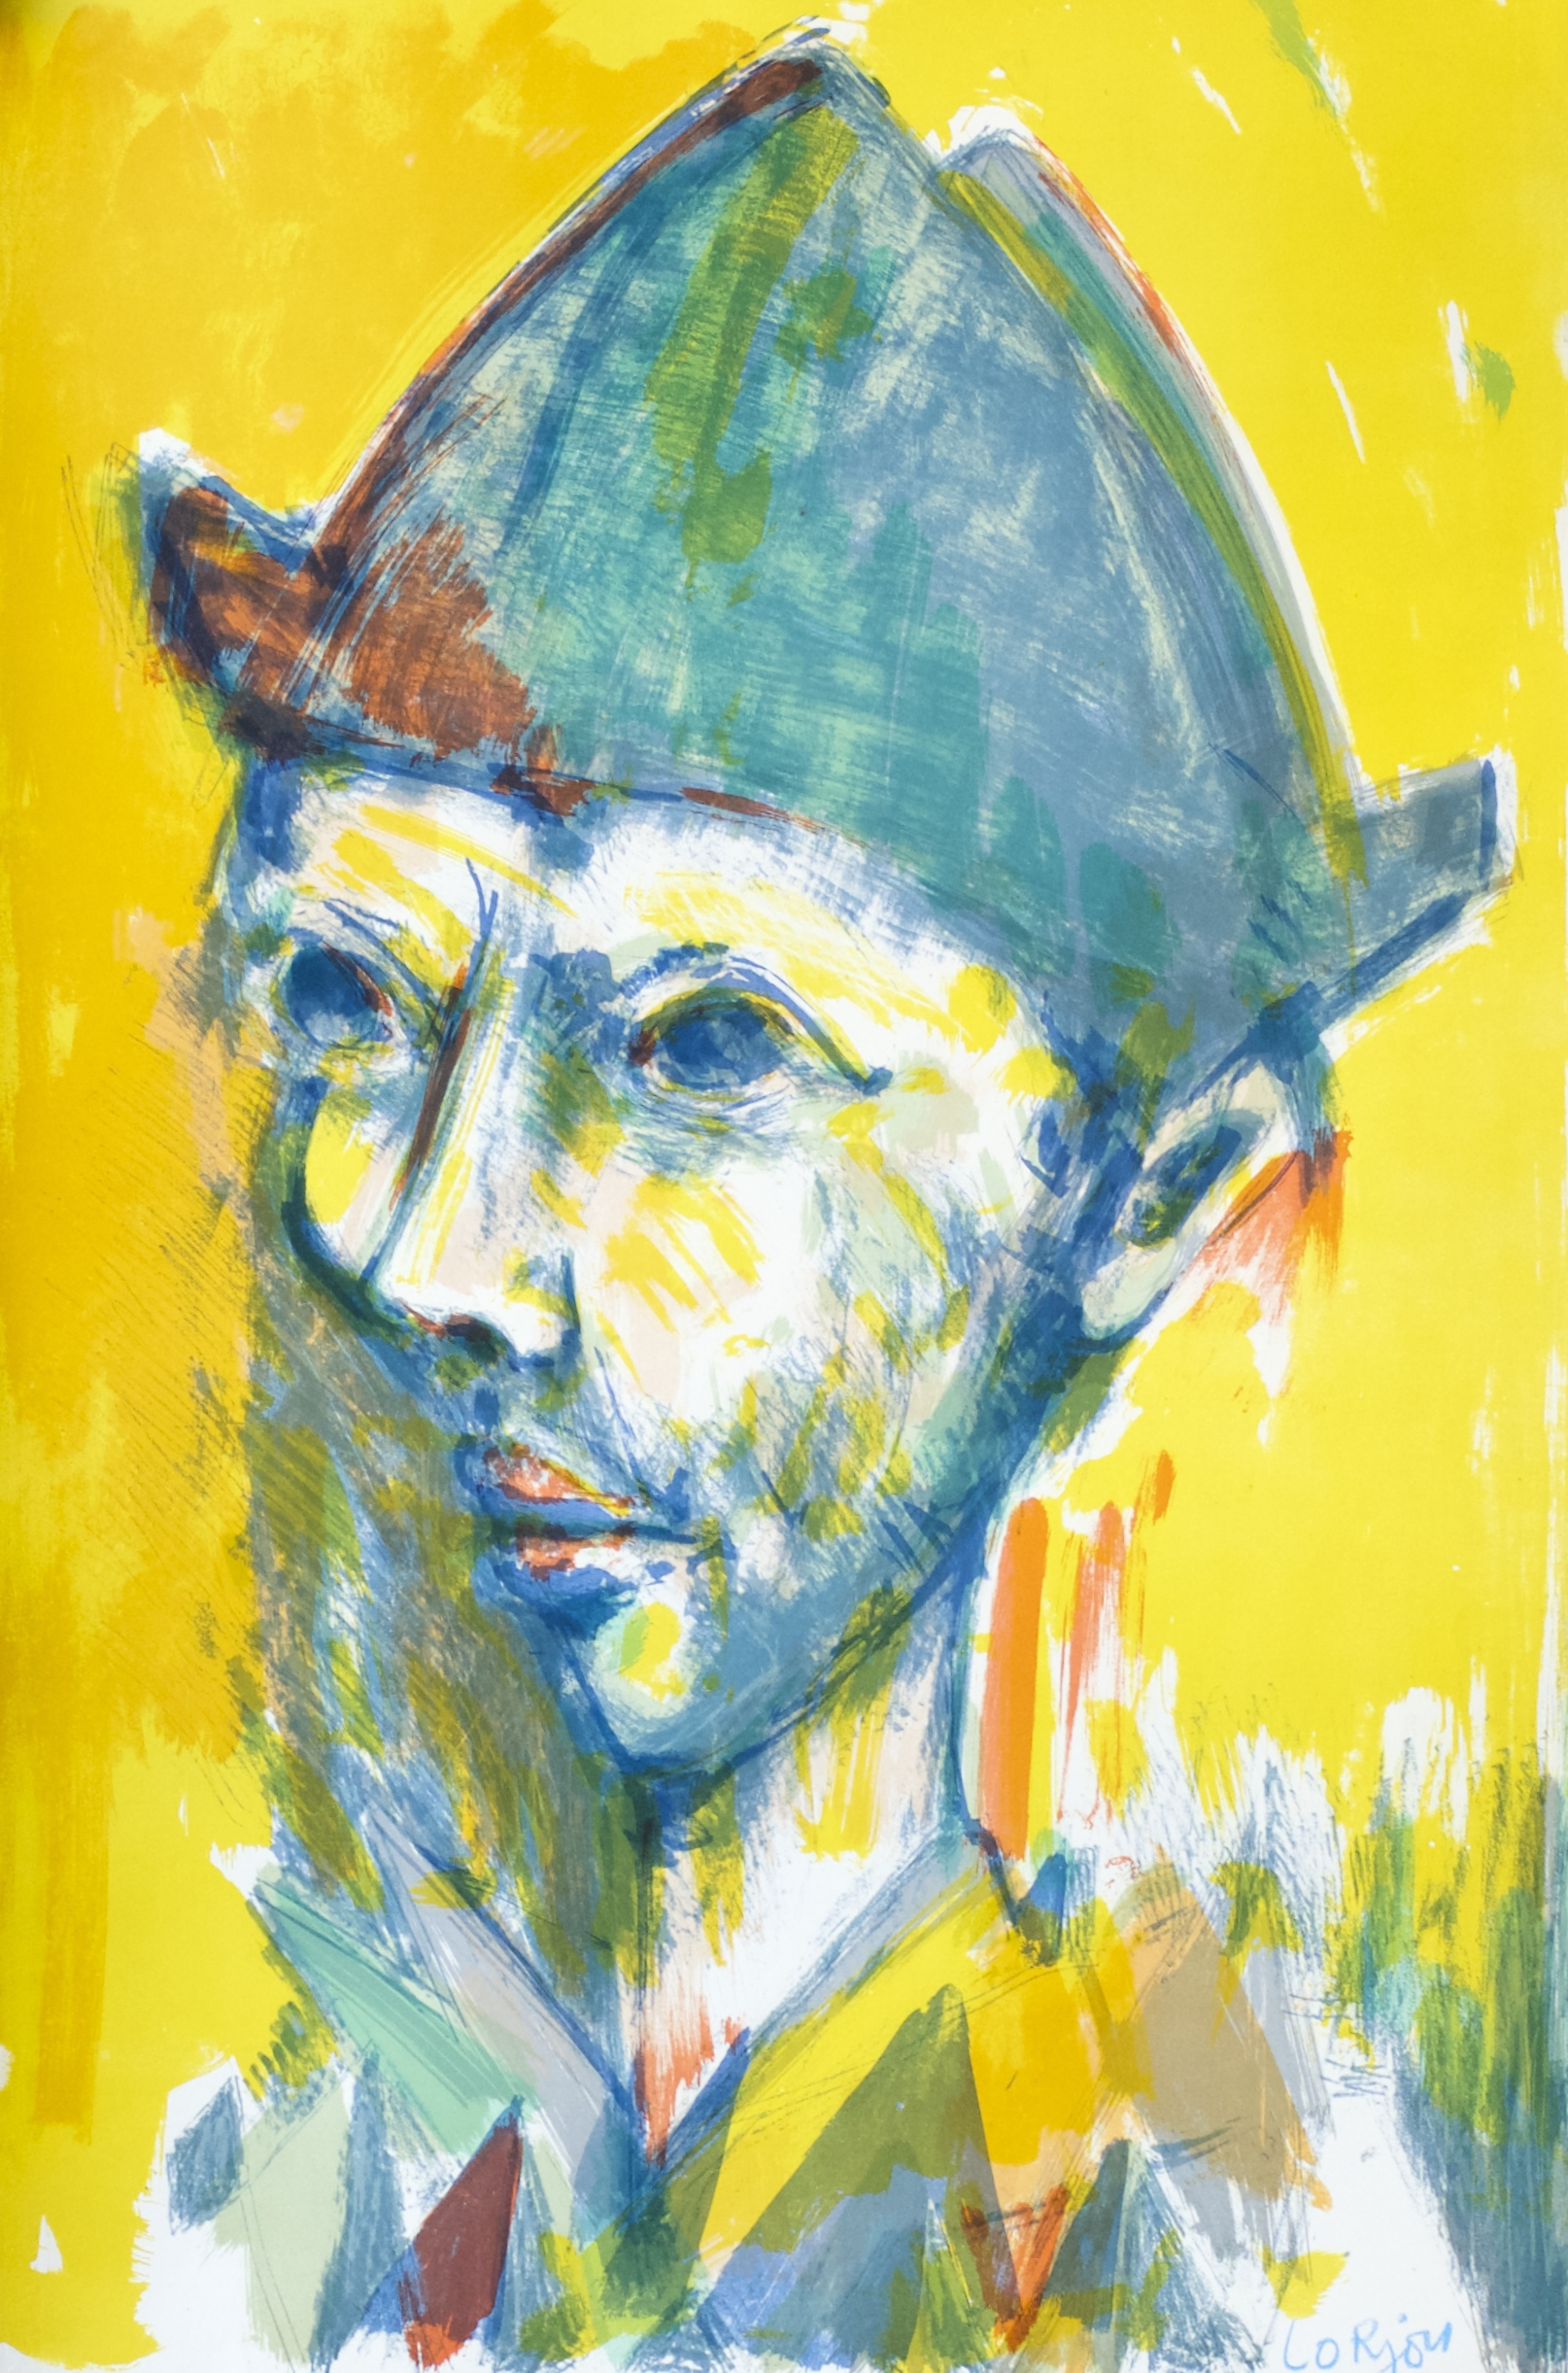 Profile of Harlequin in Yellow (Profil Gauche d'Arlequin Fond Jaune) (1959)